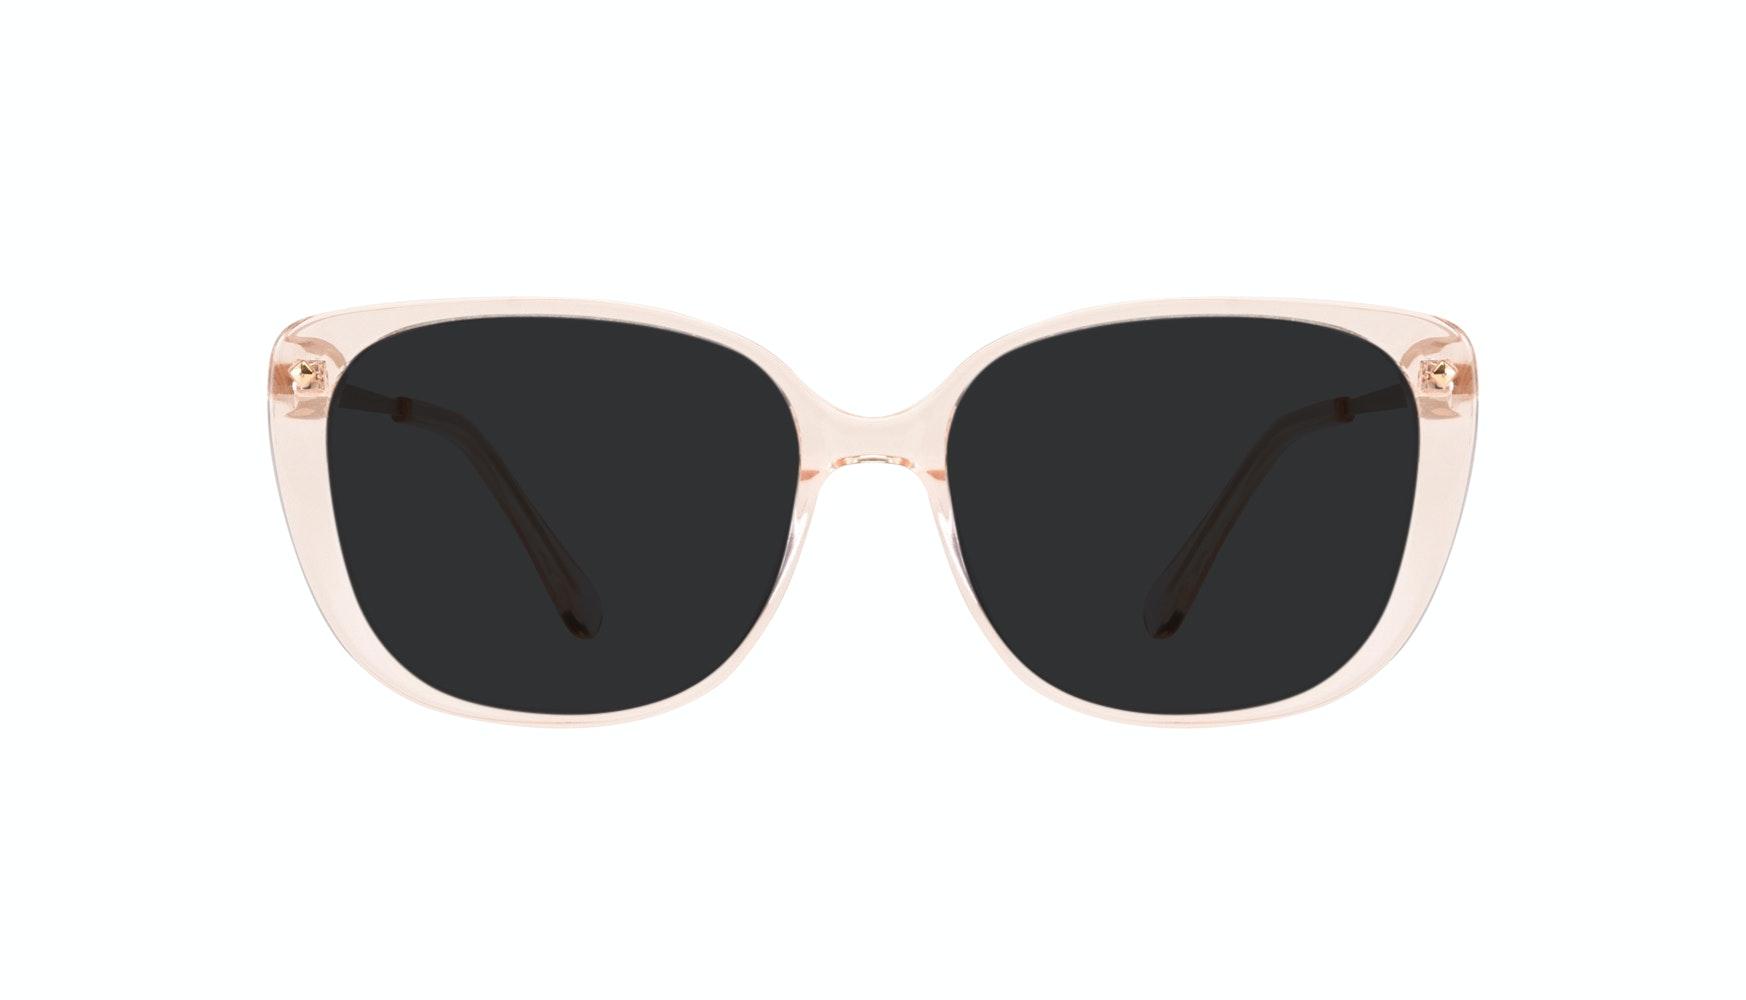 Affordable Fashion Glasses Square Sunglasses Women Japonisme Blond